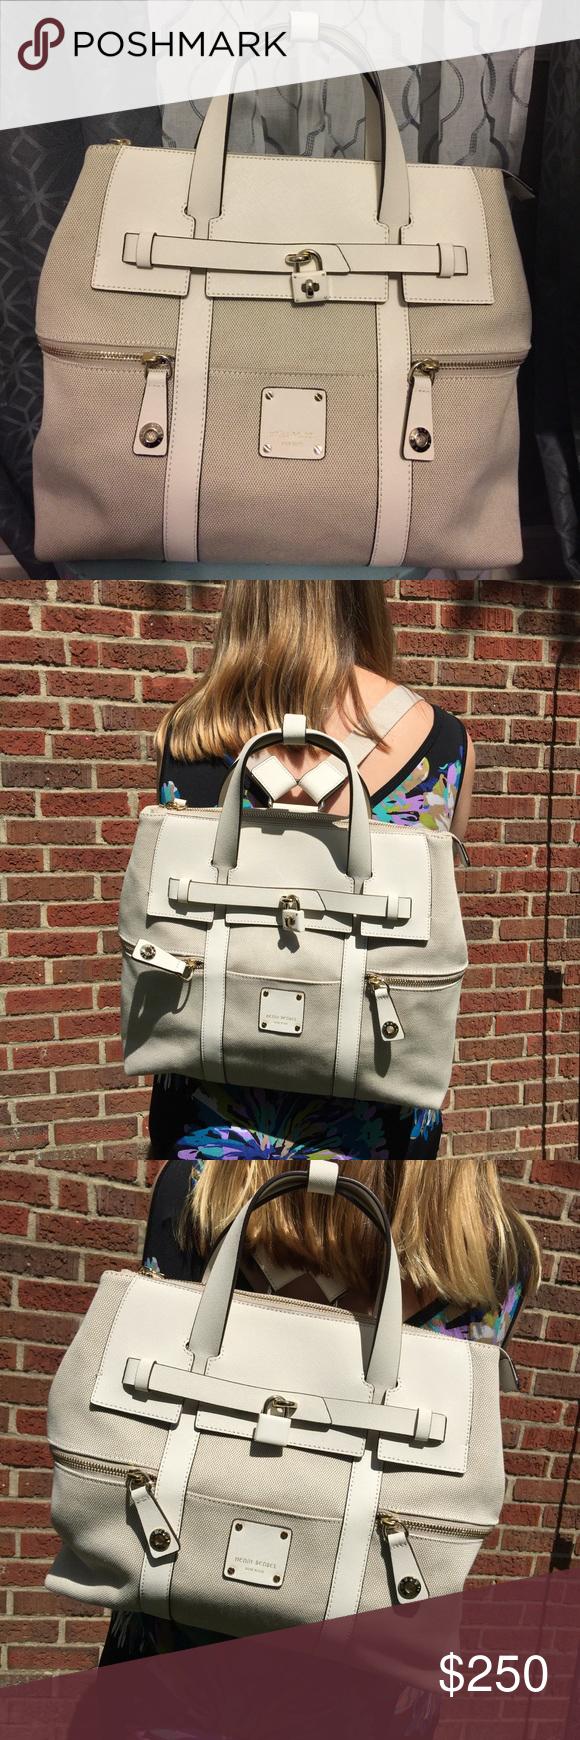 9c813fcf1 ❗️FINAL PRICE❗️Henri Bendel Jetsetter Backpack ❗️FINAL PRICE-PRICE FIRM❗️Henri  Bendel Canvas Jetsetter Convertible Backpack in color Sea Salt. Bag ...